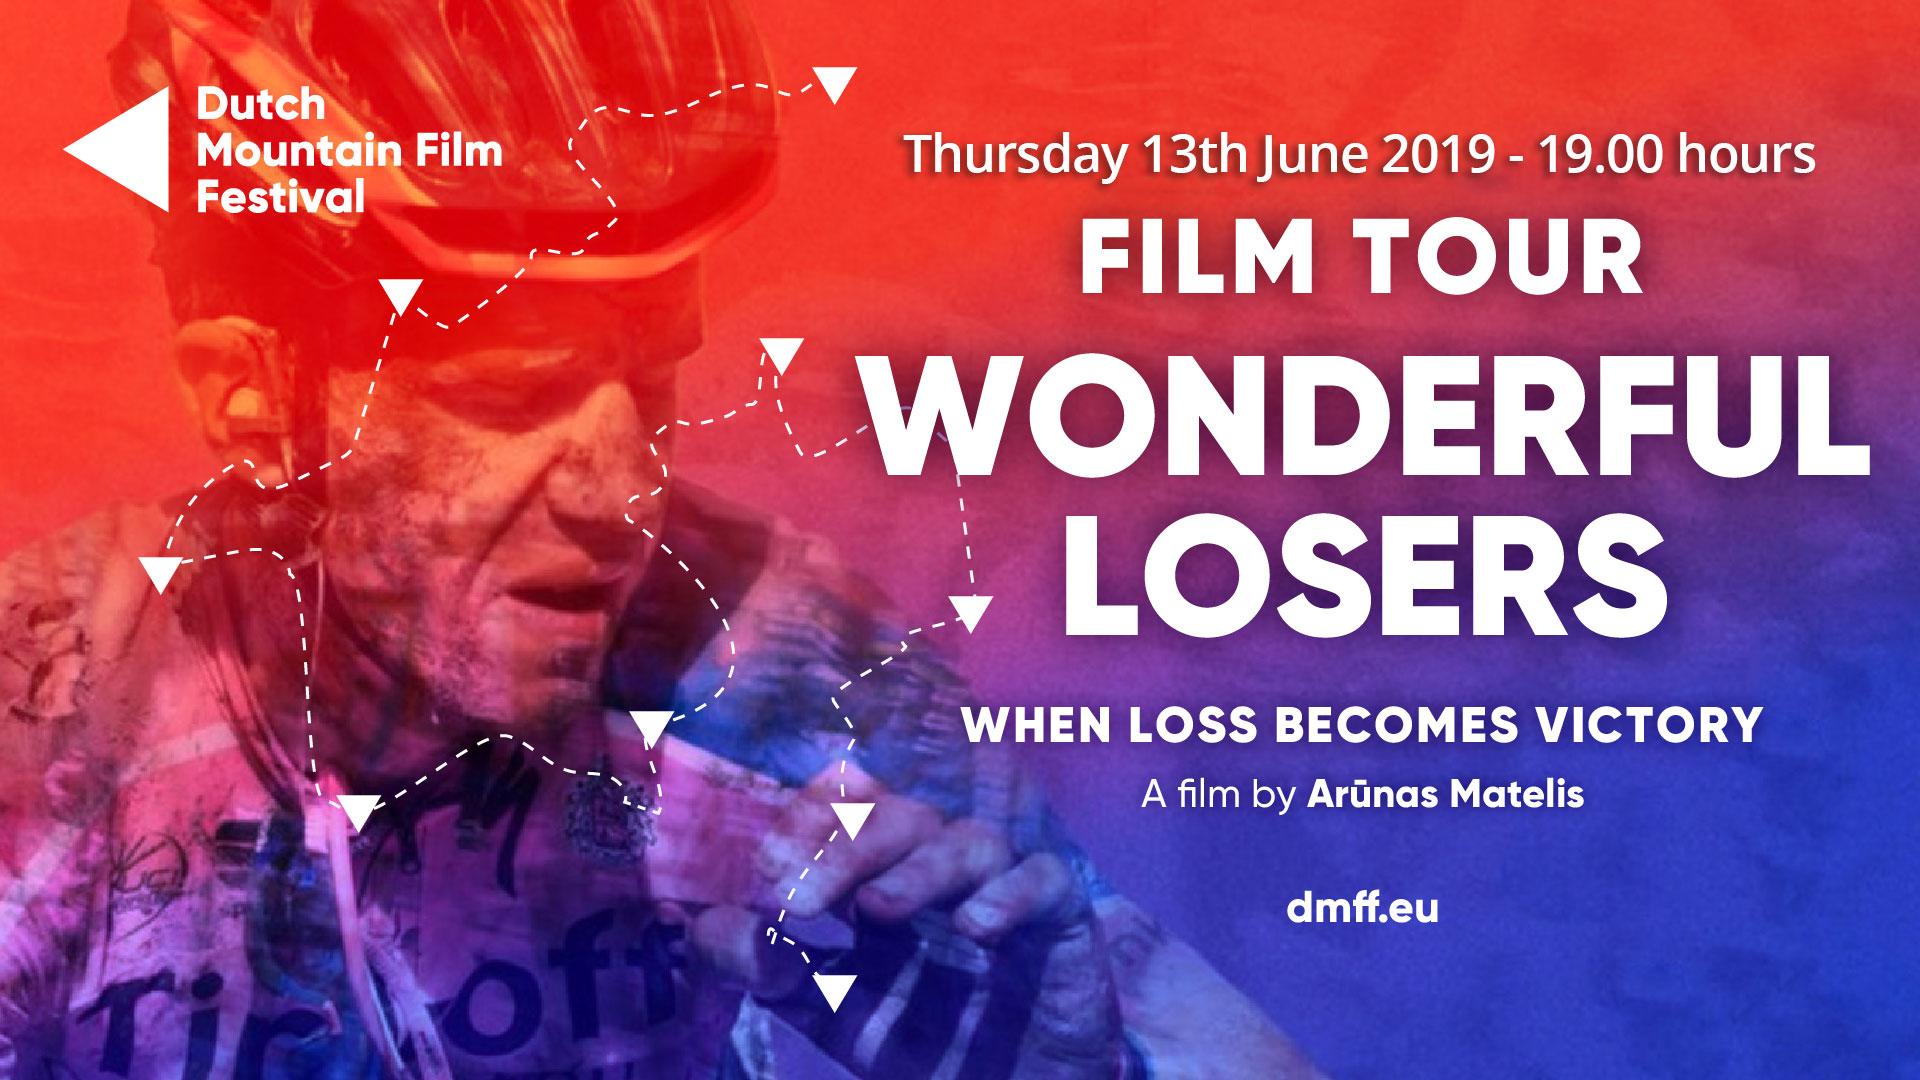 Film screening Wonderfull Losers: A Different World